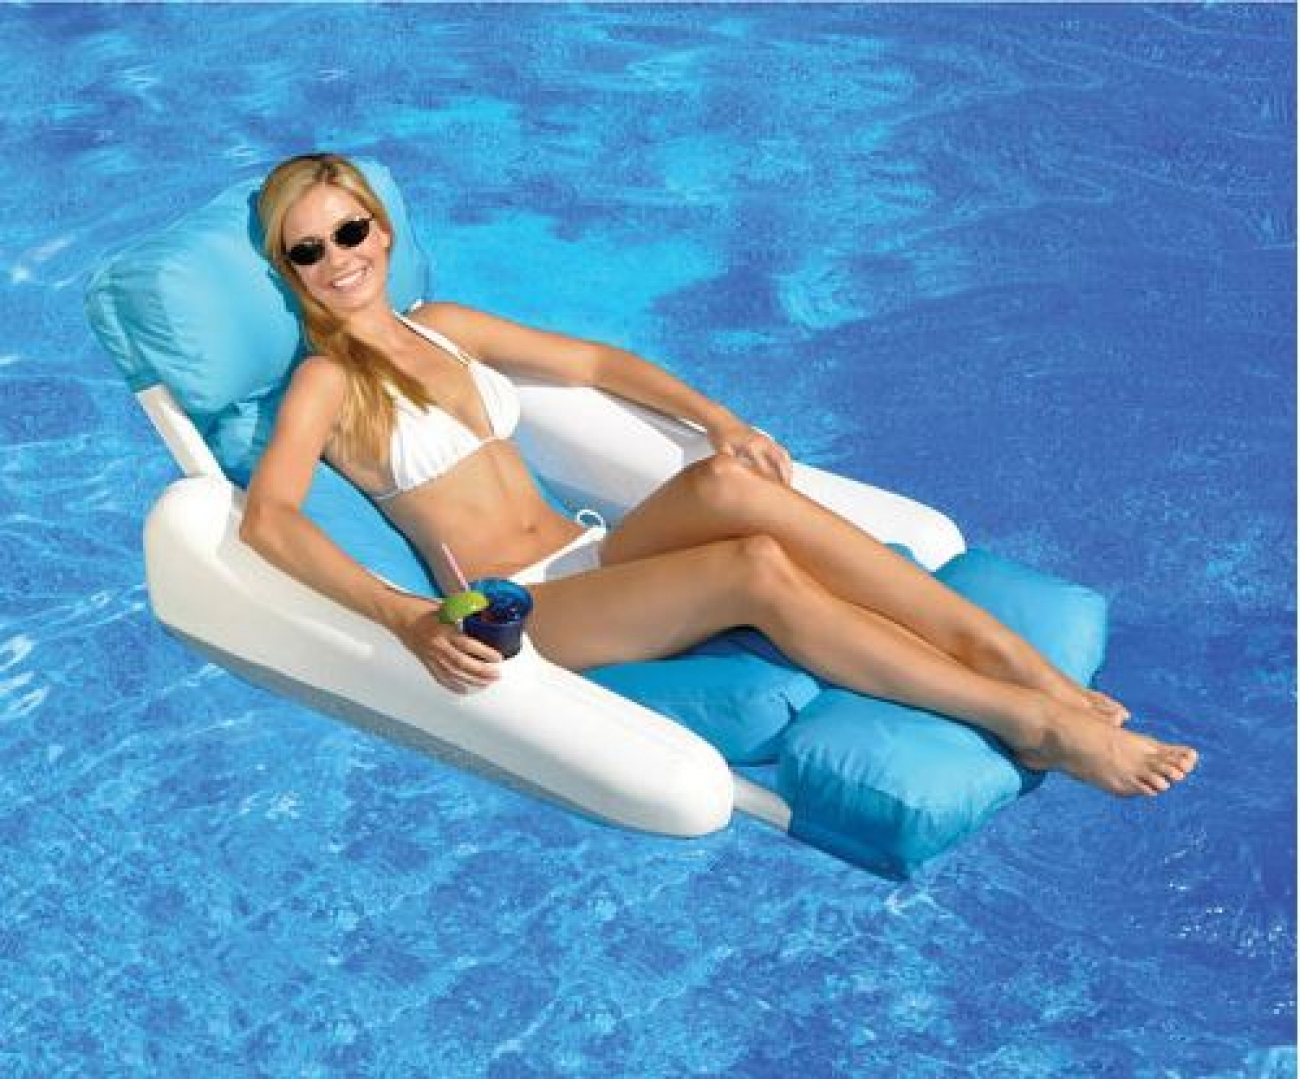 Swimline Sunchaser Luxury Inflatable Pool Lounger Float